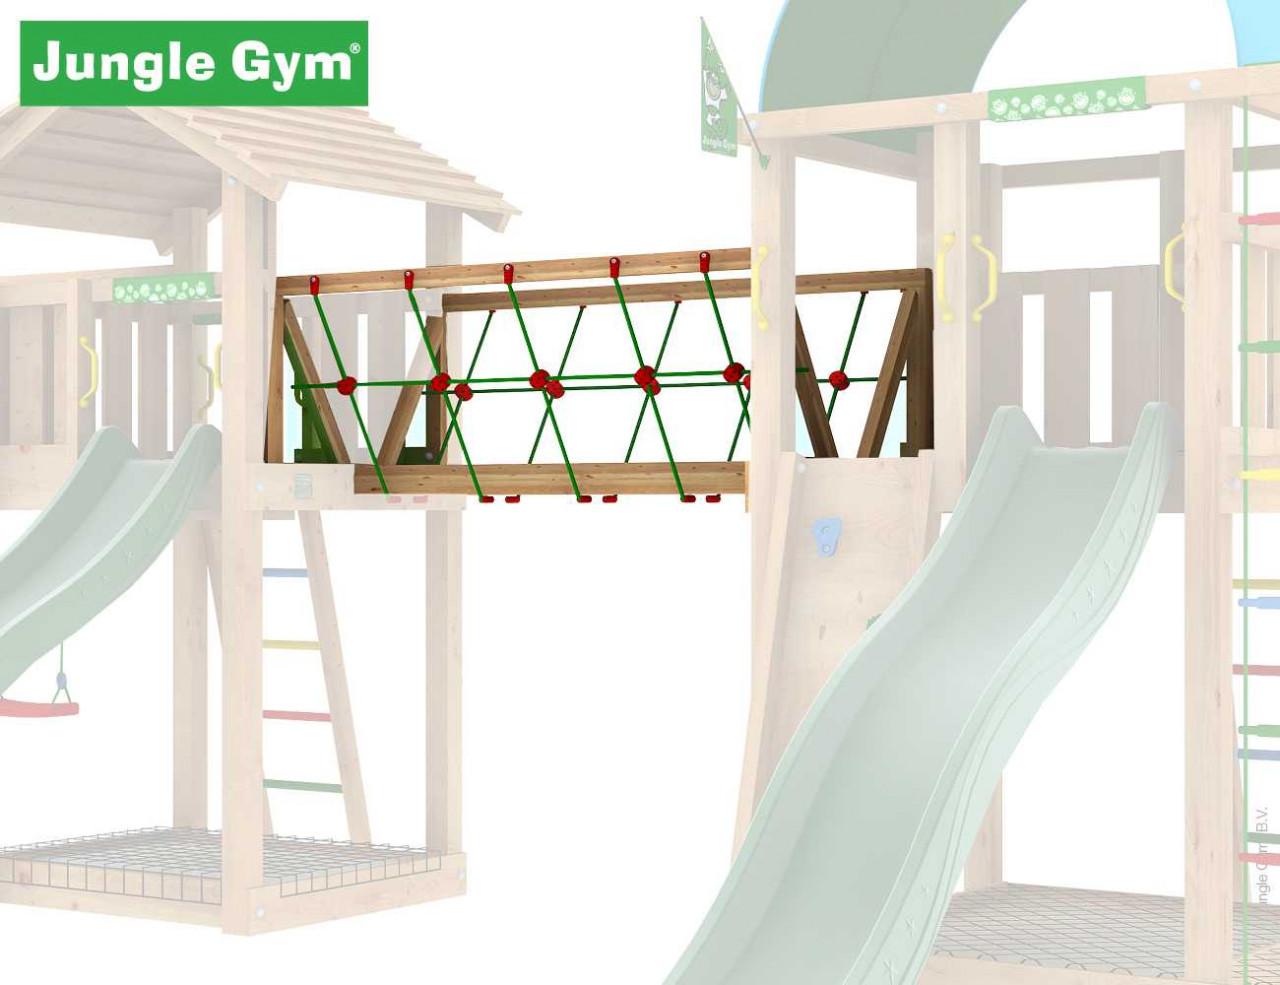 Jungle Gym Net-Link in Douglasie natur